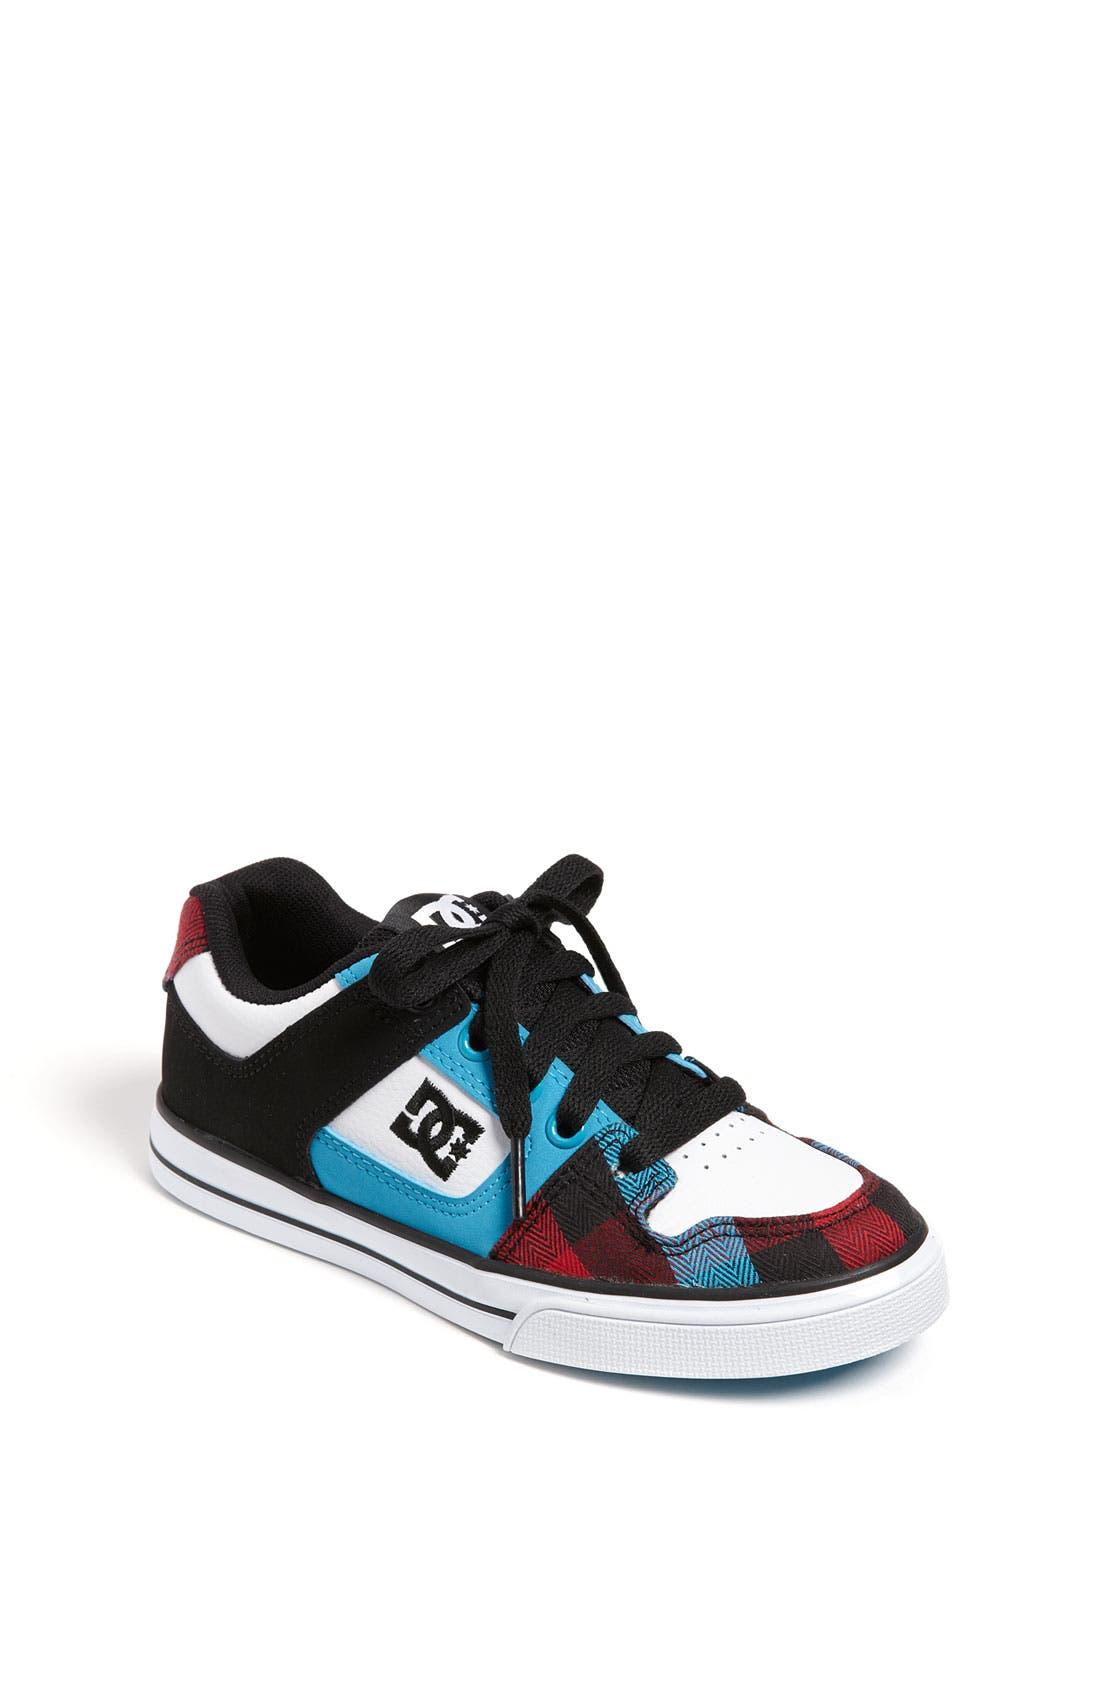 Alternate Image 1 Selected - DC Shoes 'Pure' Sneaker (Toddler, Little Kid & Big Kid)